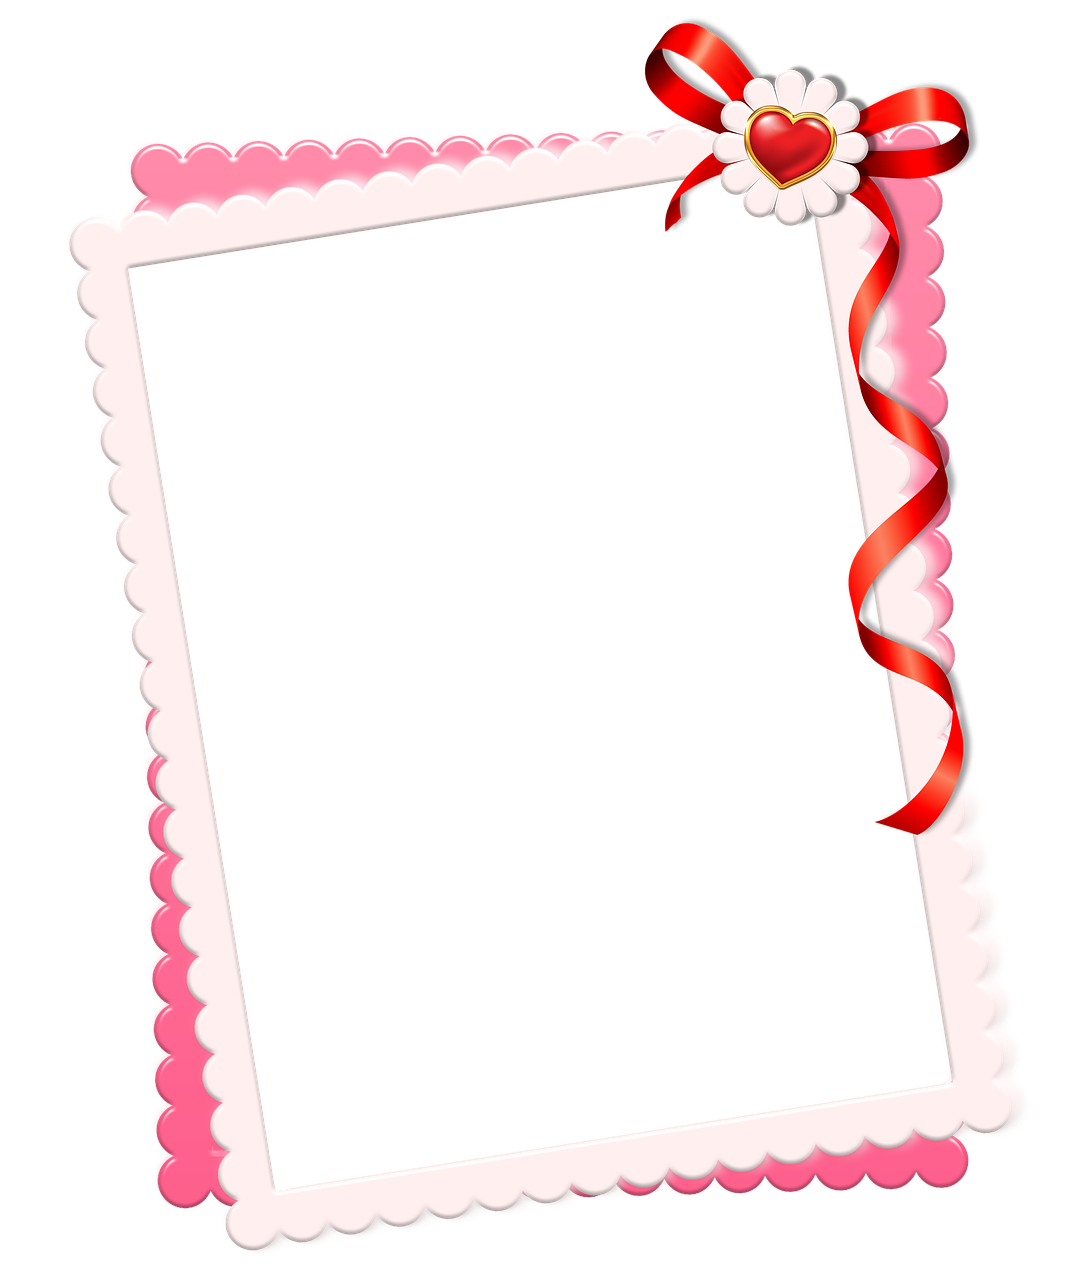 Frame,romance,photoshop,heart,transparent background - free photo ...